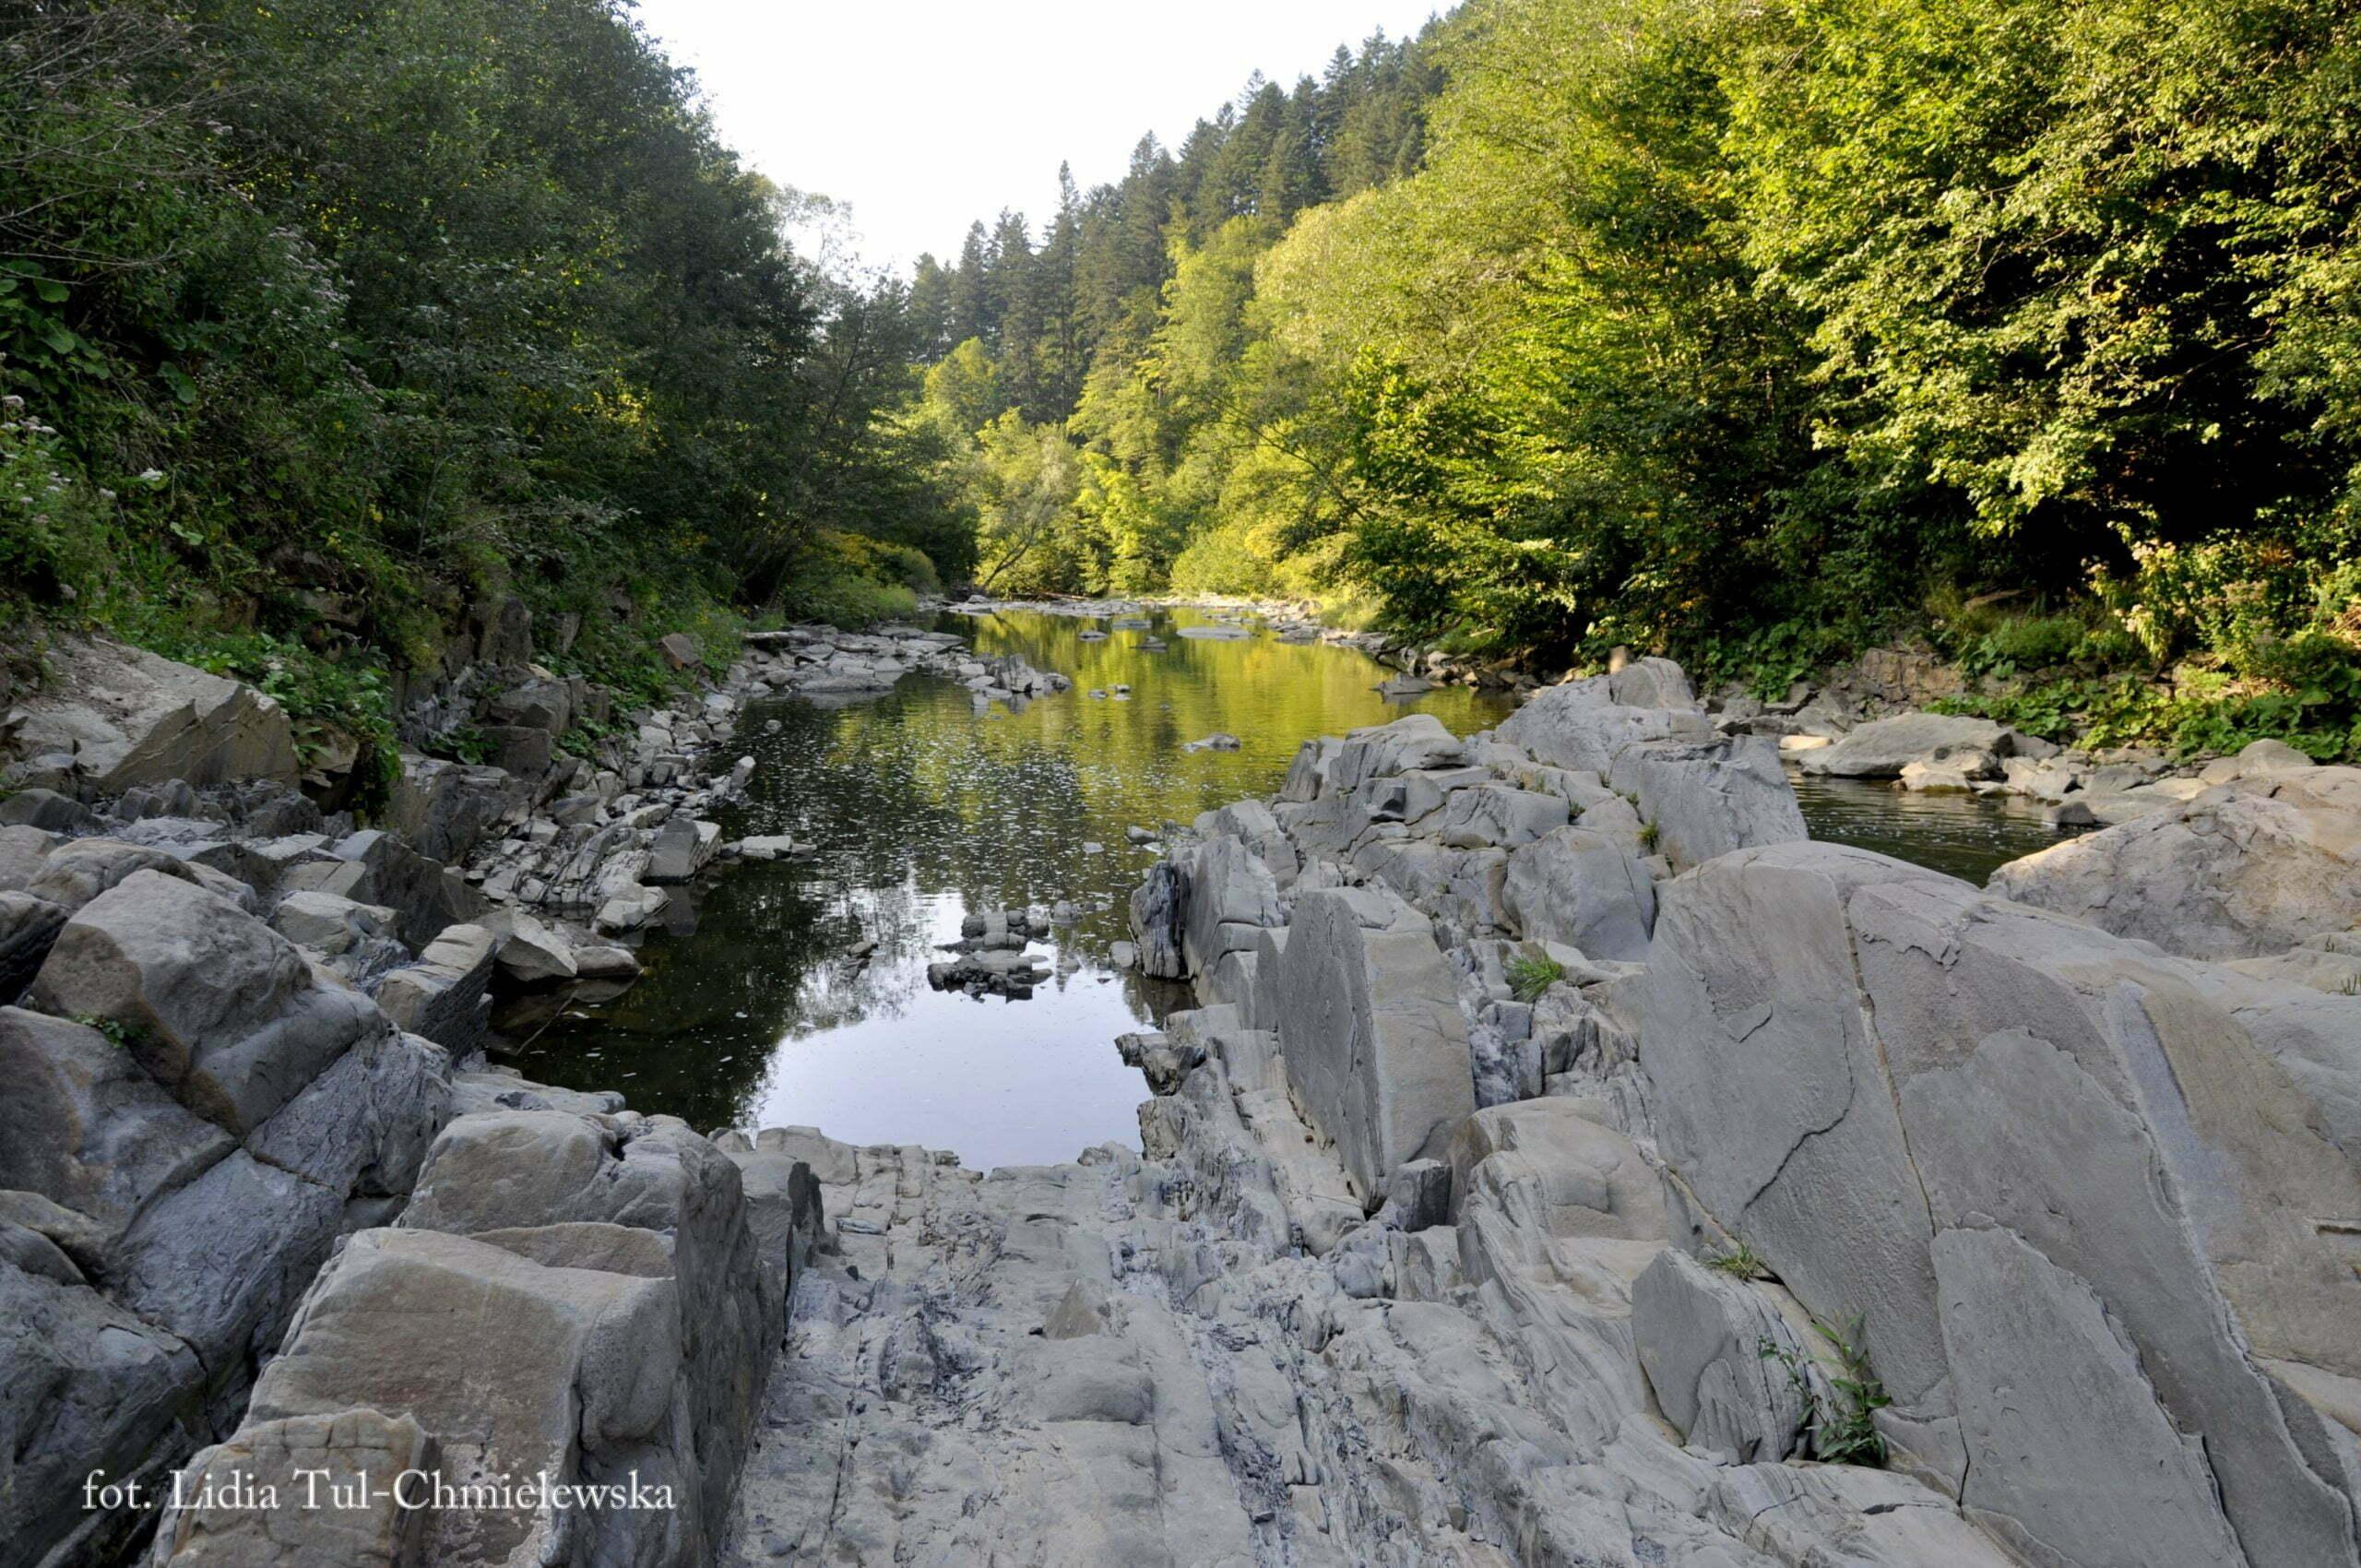 Progi skalne na potoku  / fot. Lidia Tul-Chmielewska